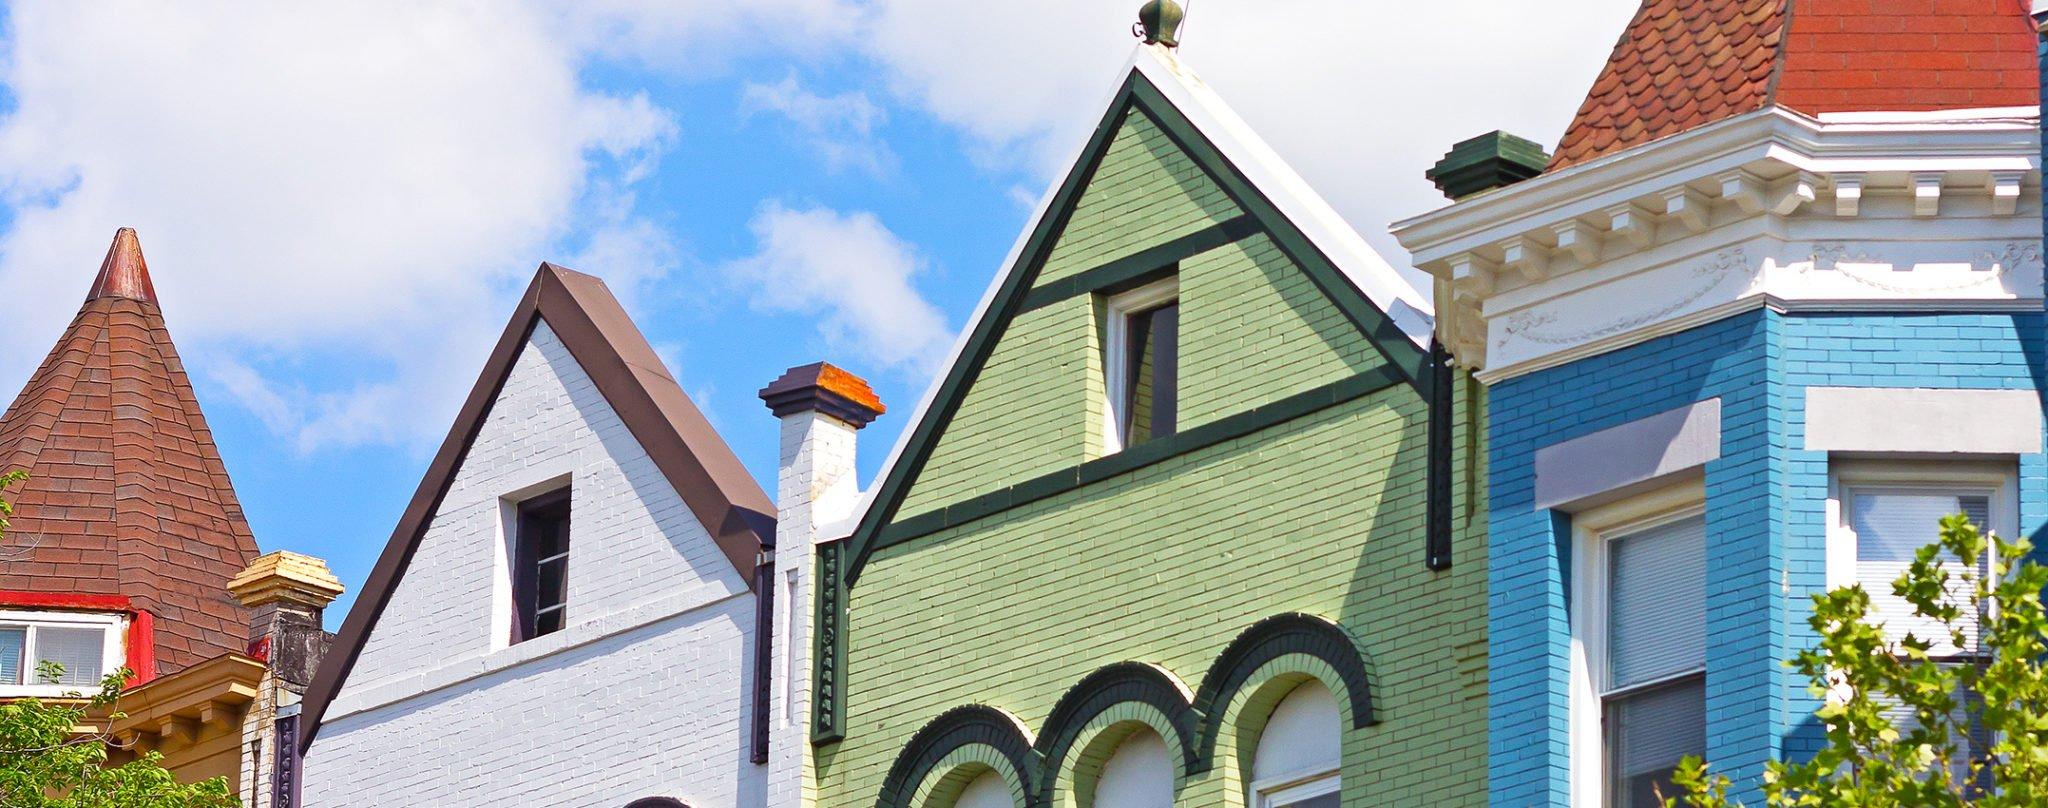 DC Neighborhood Guide: DC Rowhouses. DC Neighborhoods. Photograph via iStock.